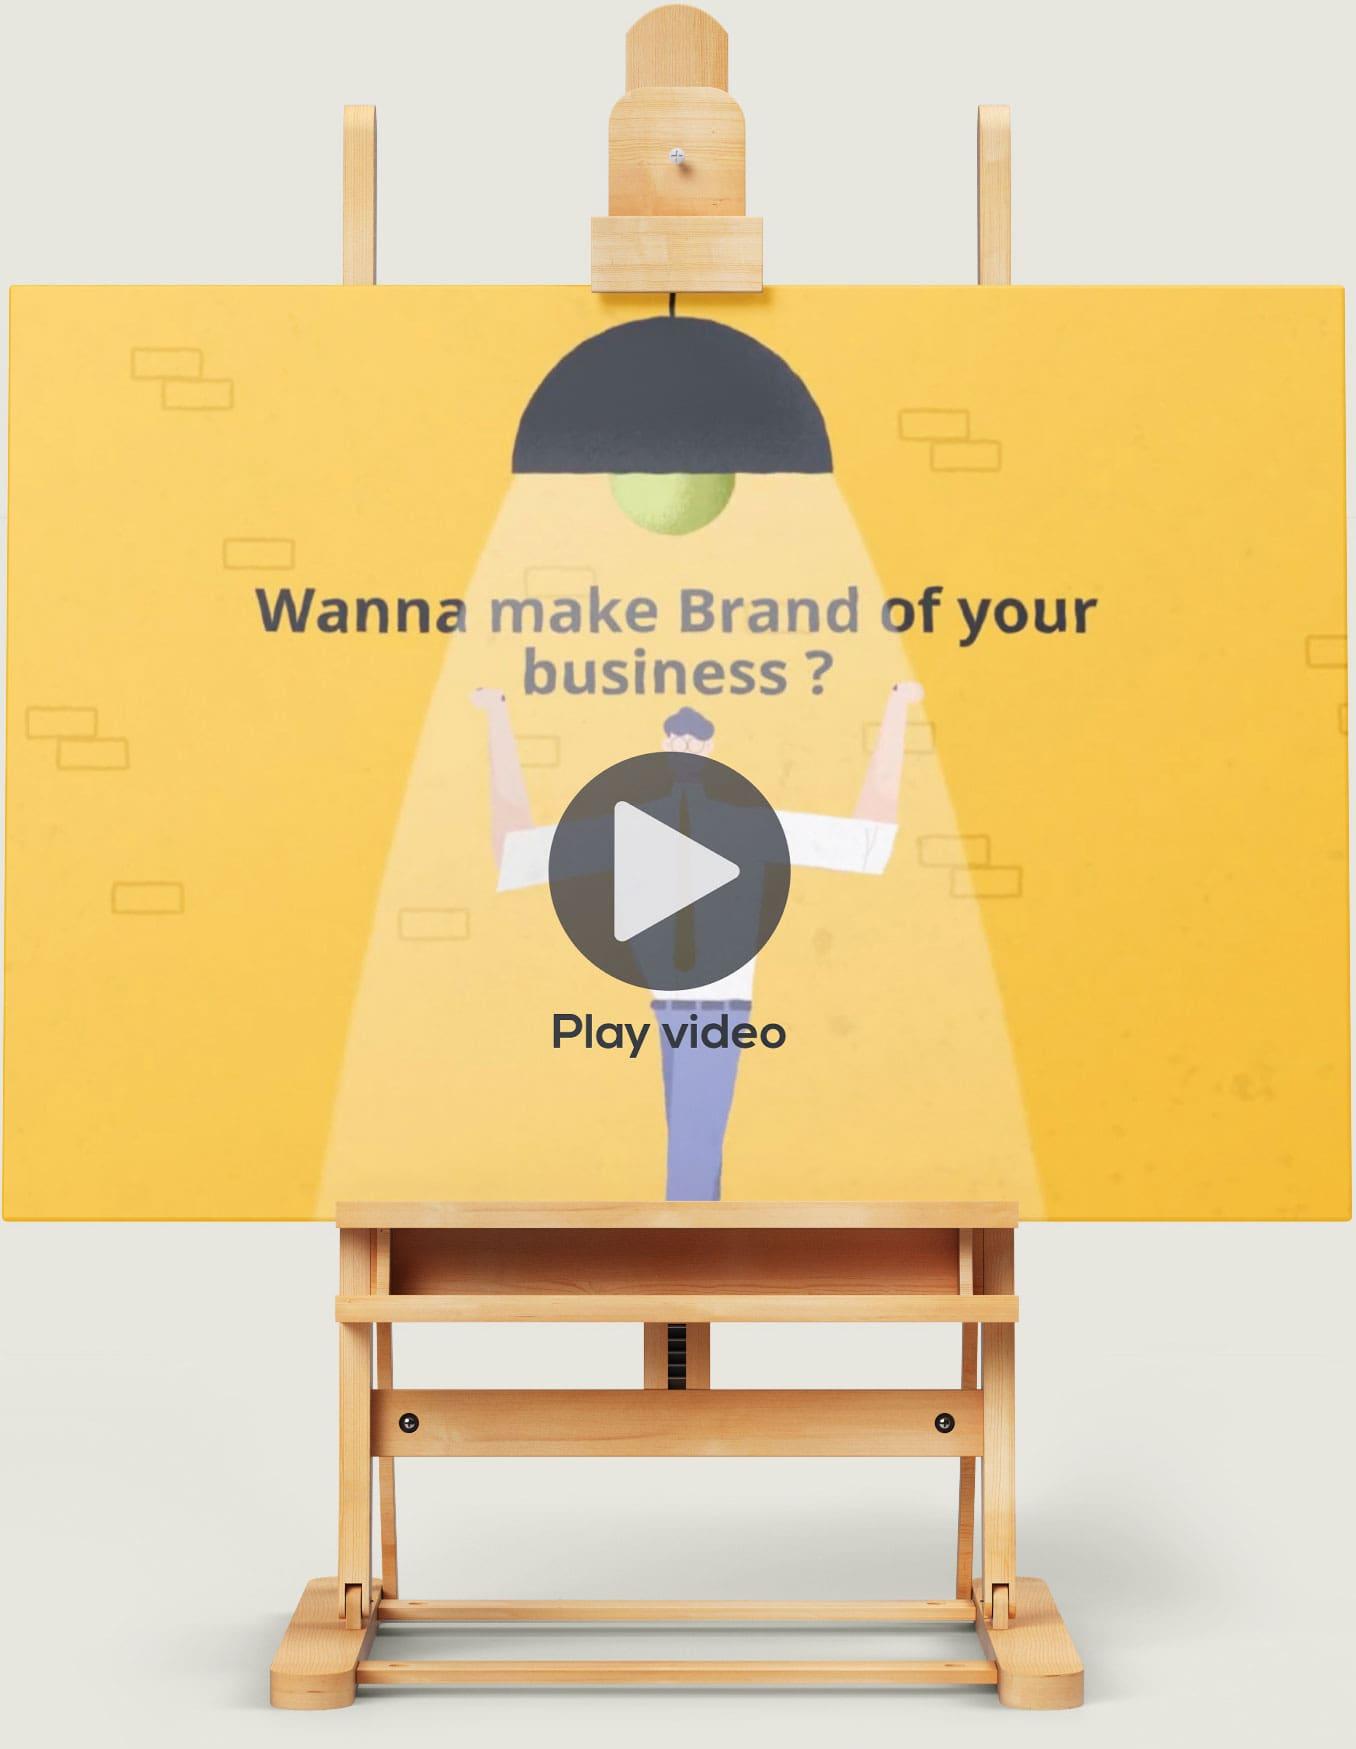 brand-video-image